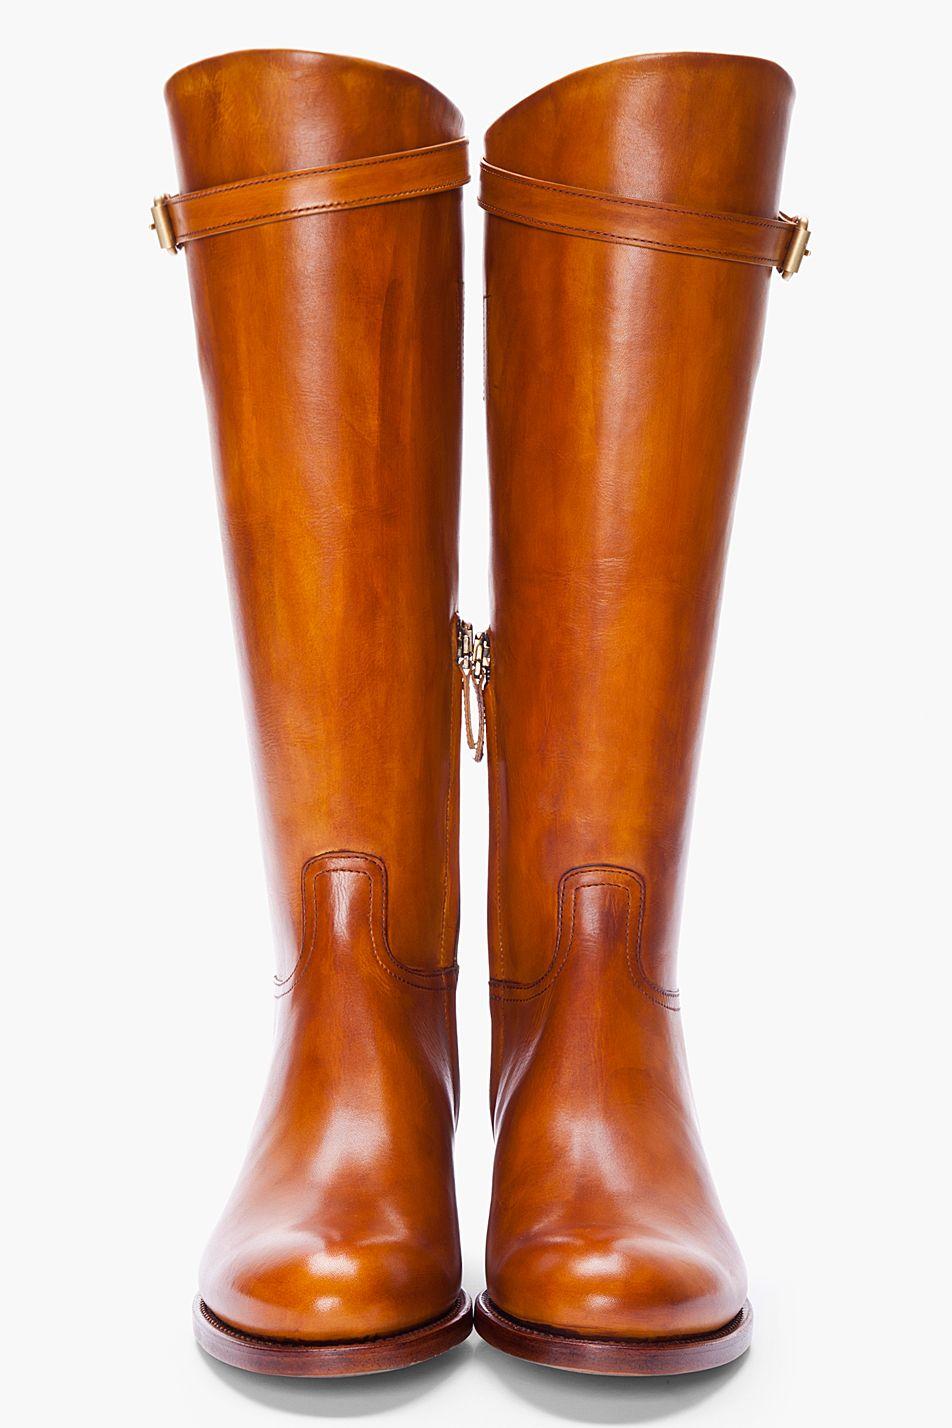 RUPERT SANDERSON Tan Leather Vermont Riding Boots